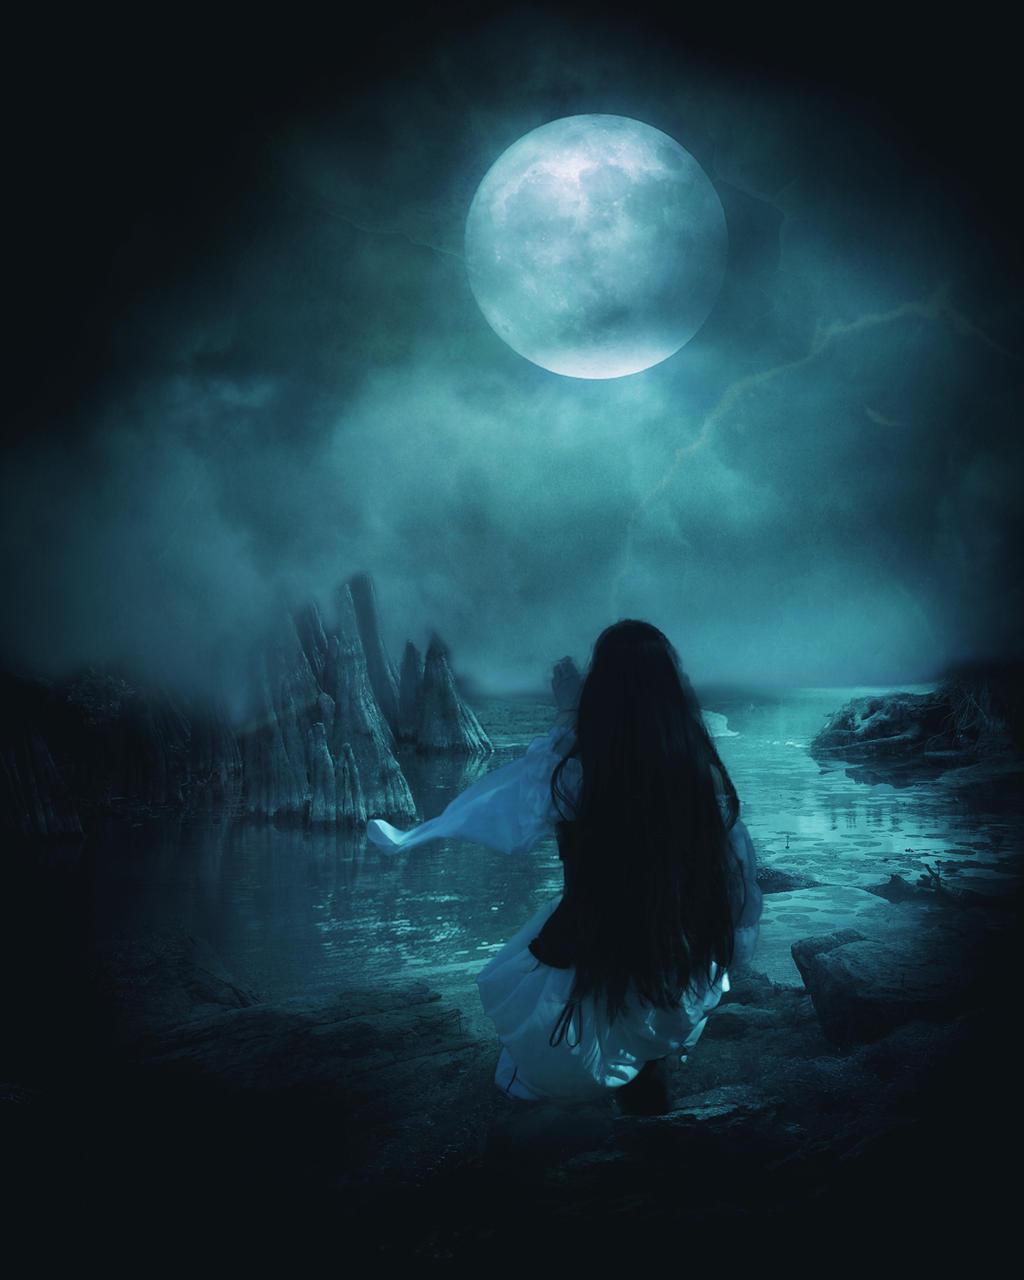 Blue moon by Akxiv